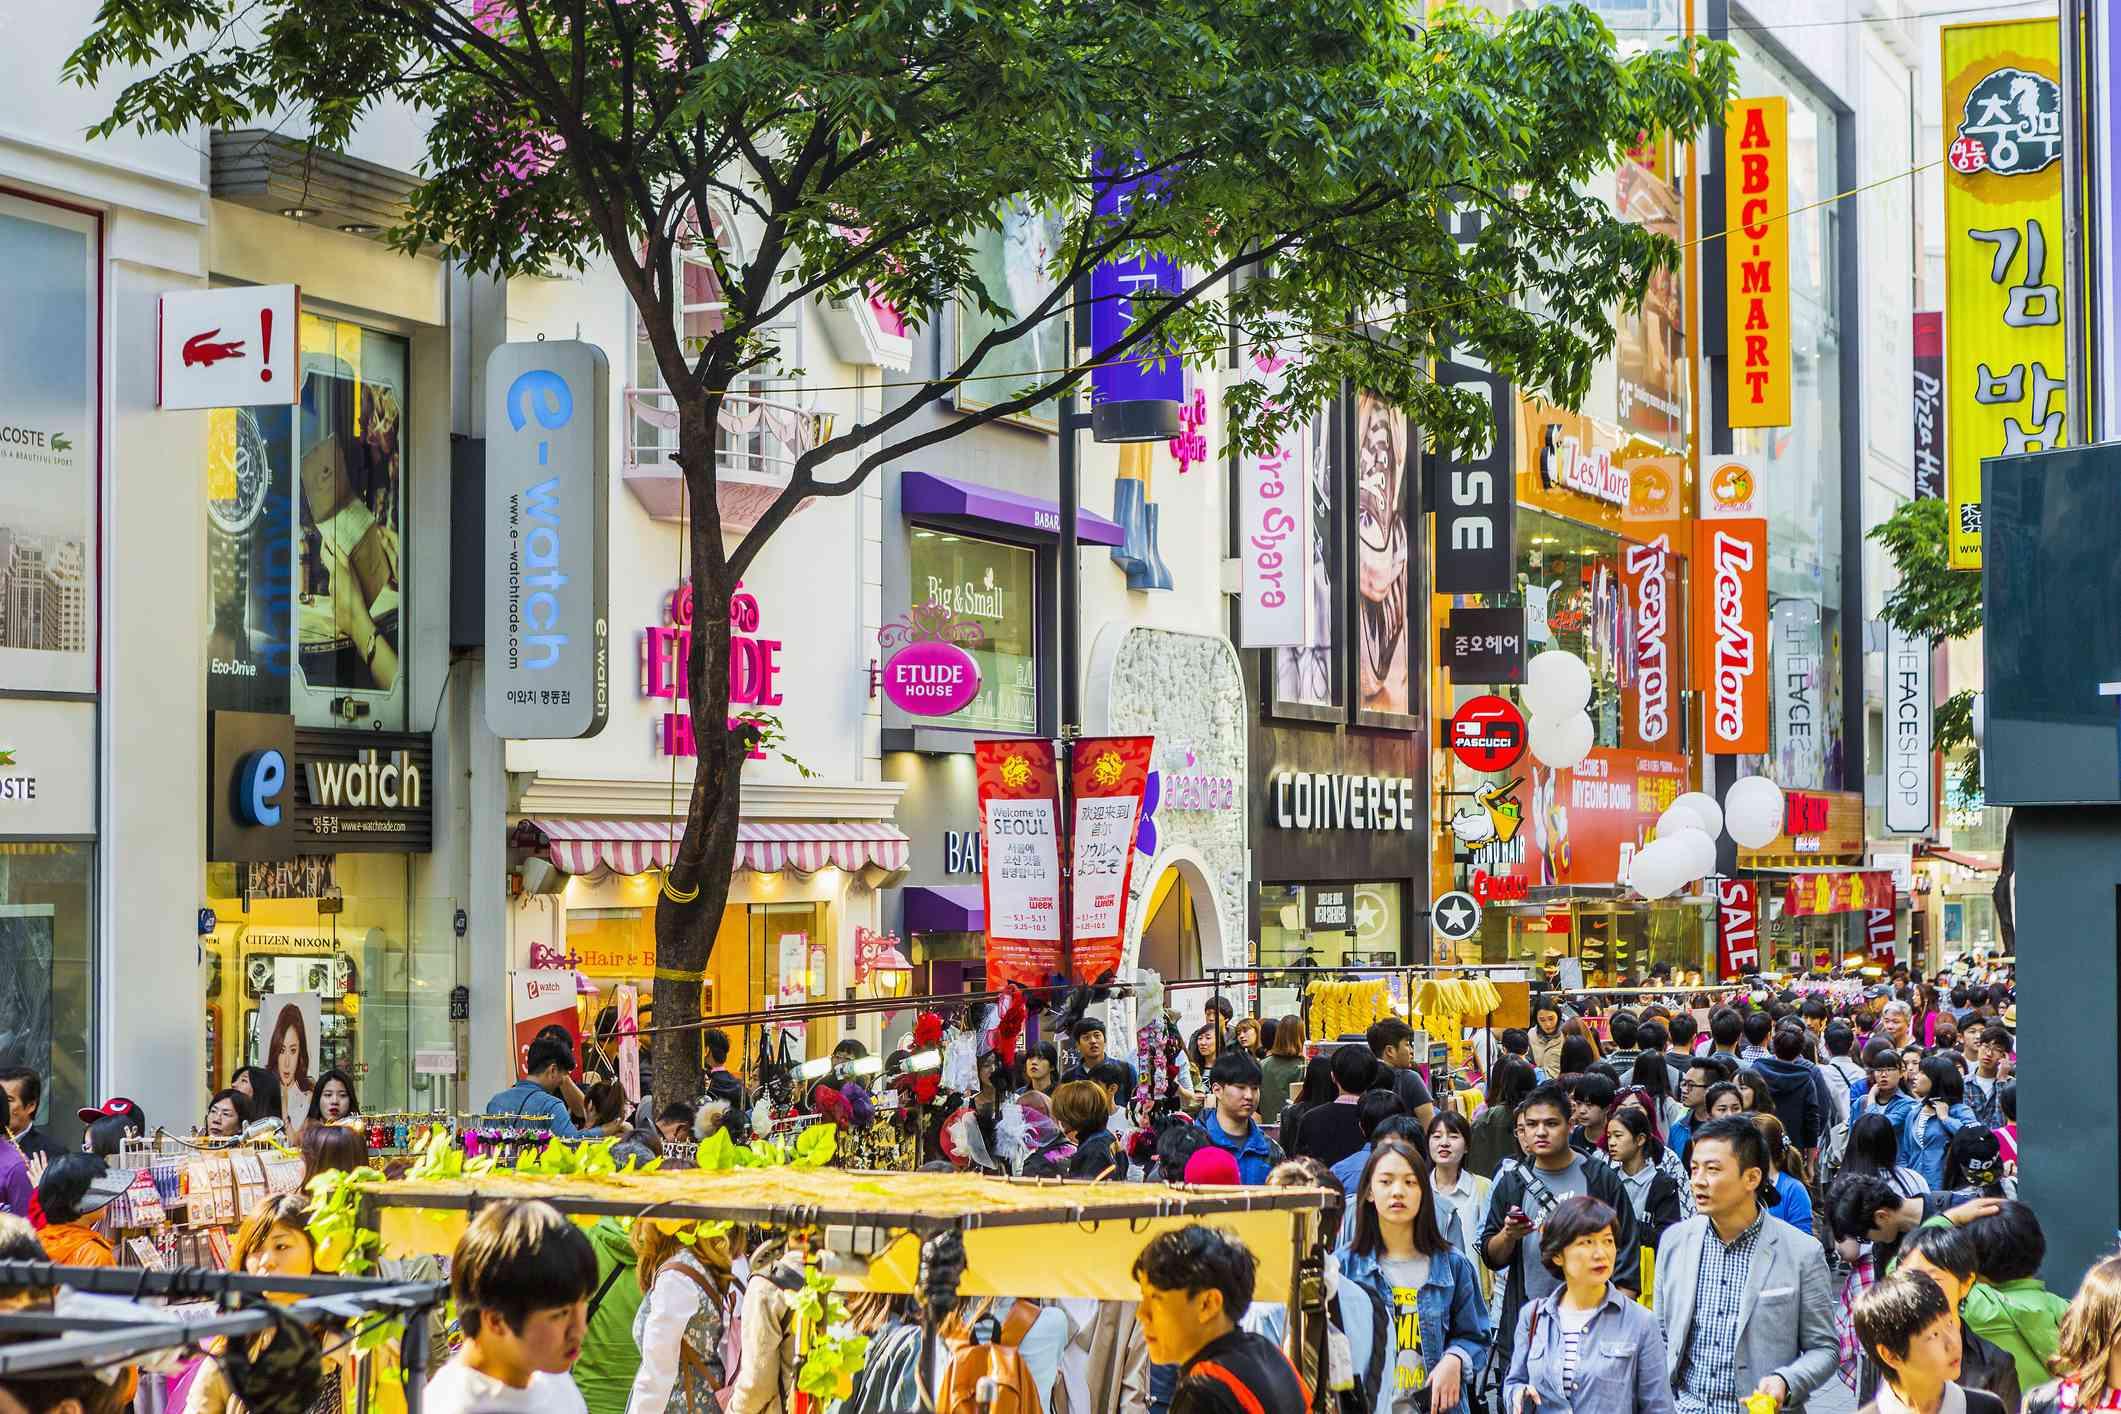 Las famosas calles comerciales de Myeong-dong